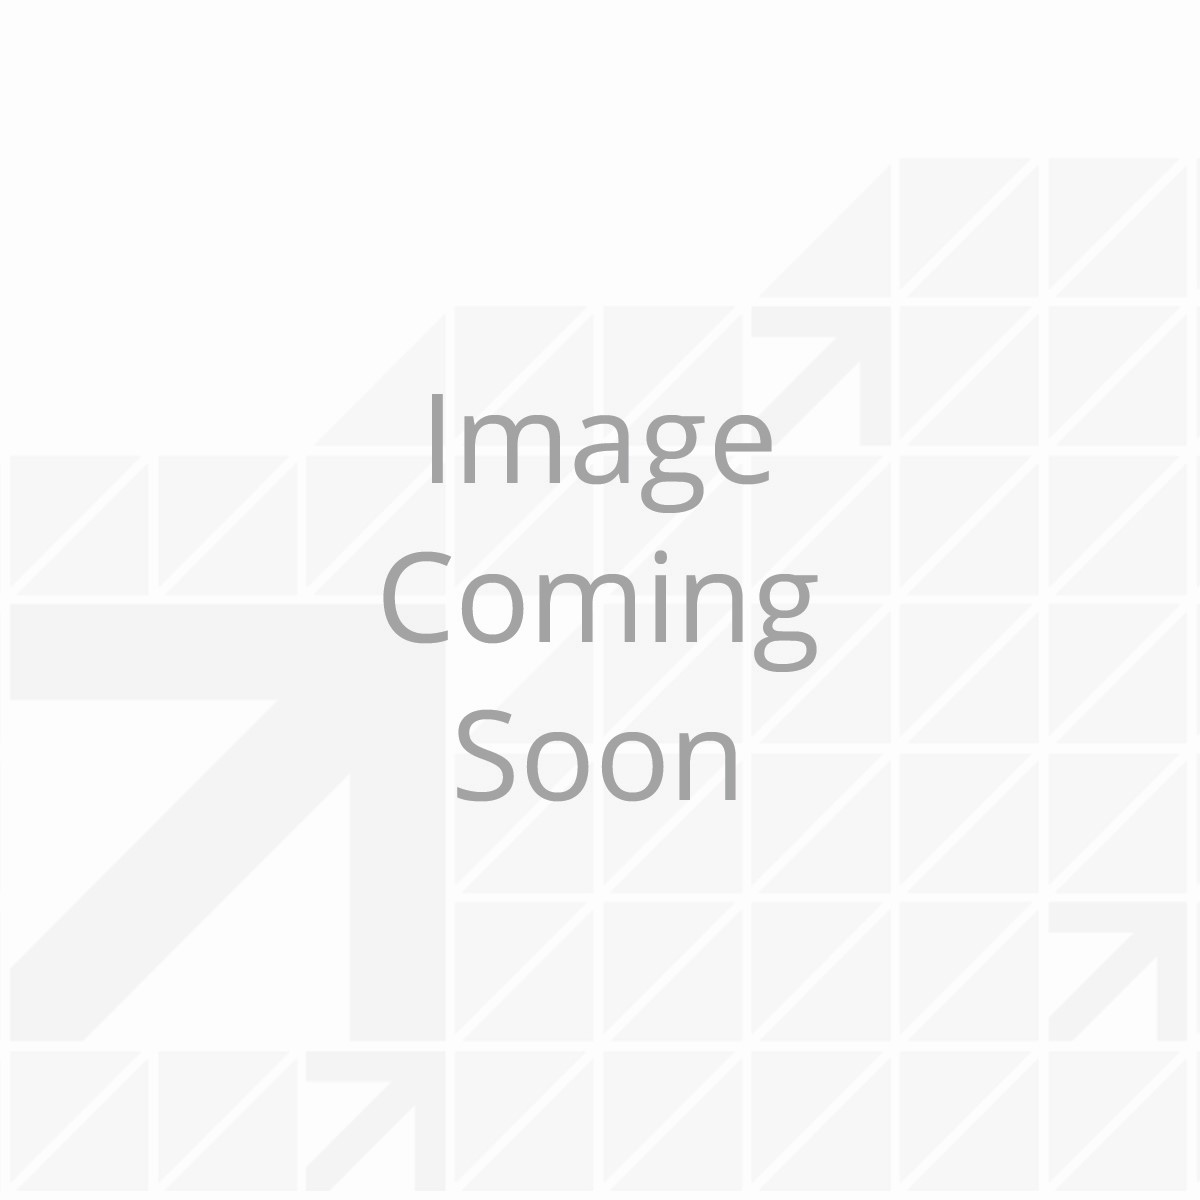 50A 125/250V Marine LED Cordset -  Various Options